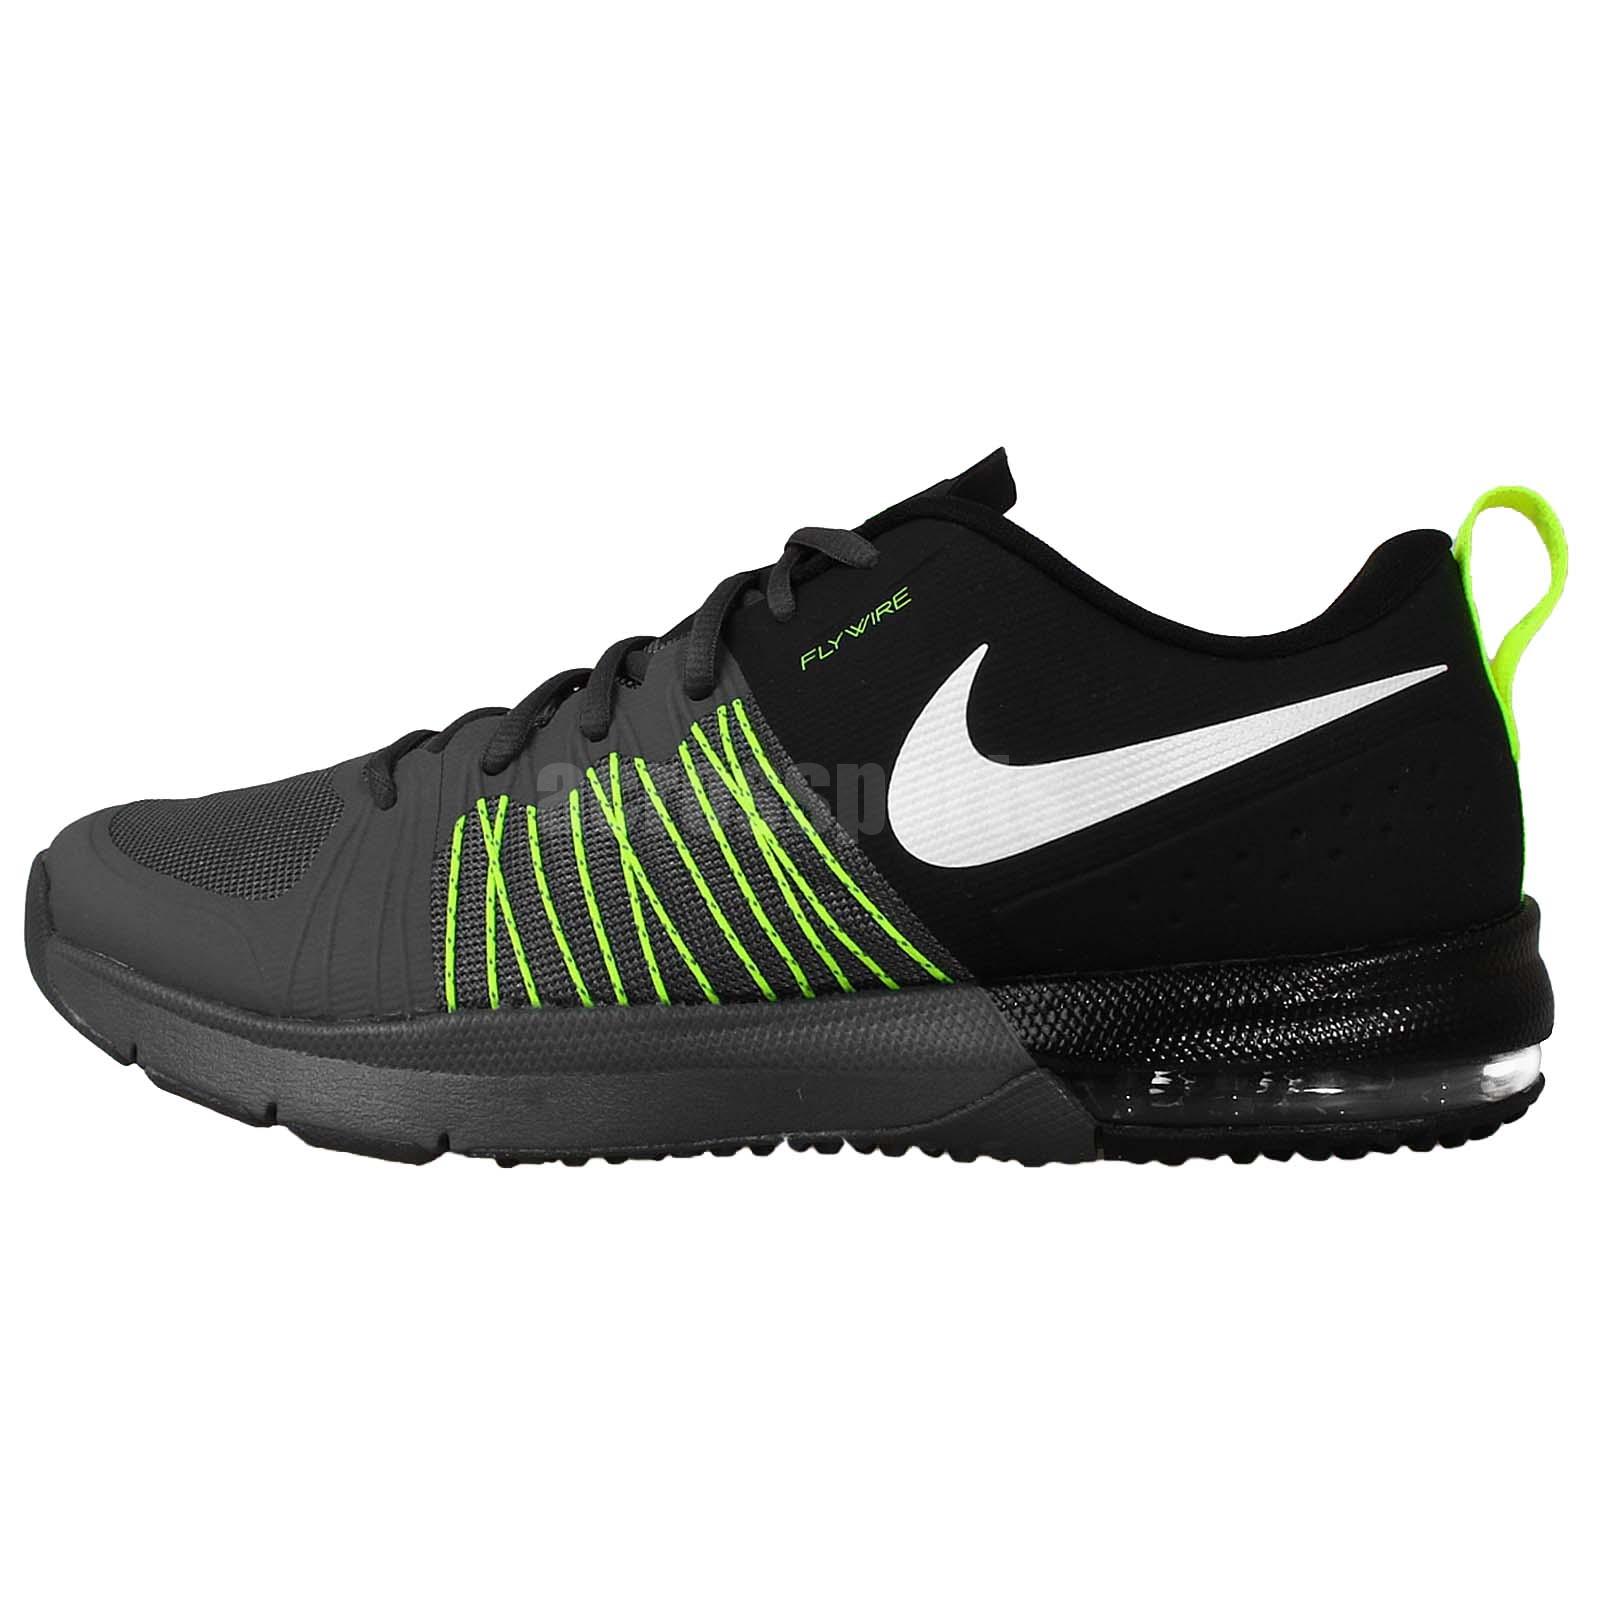 c99306fe8c3 Nike Training Flywire